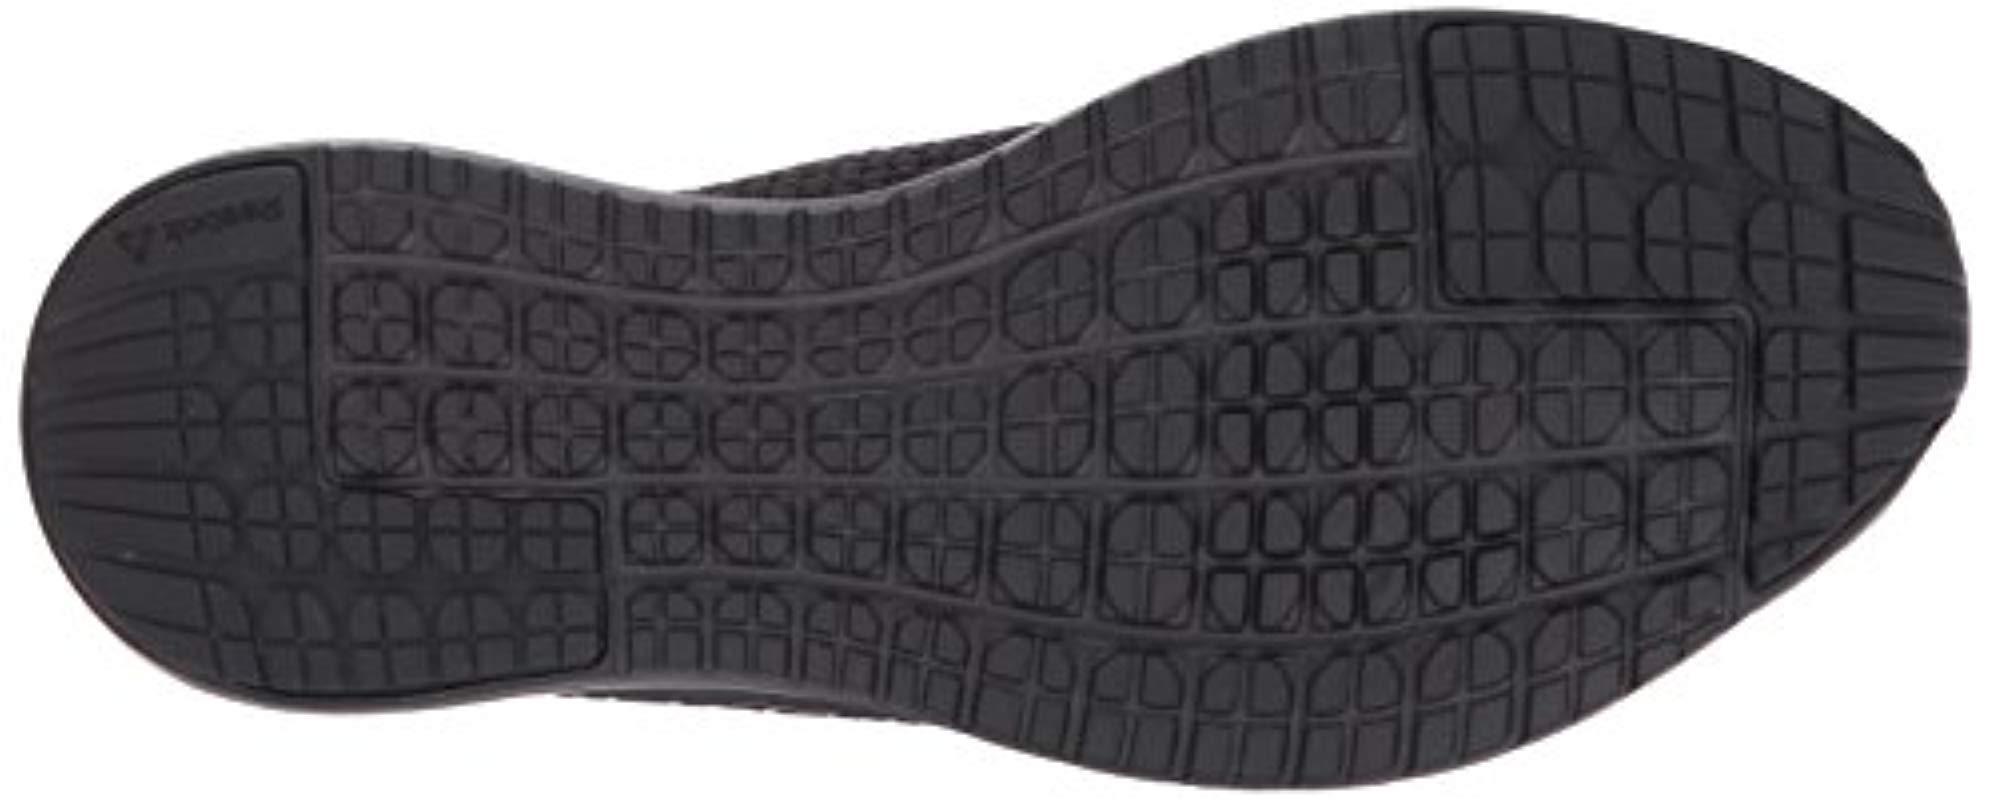 Reebok Plus Runner Woven Sneaker in Black